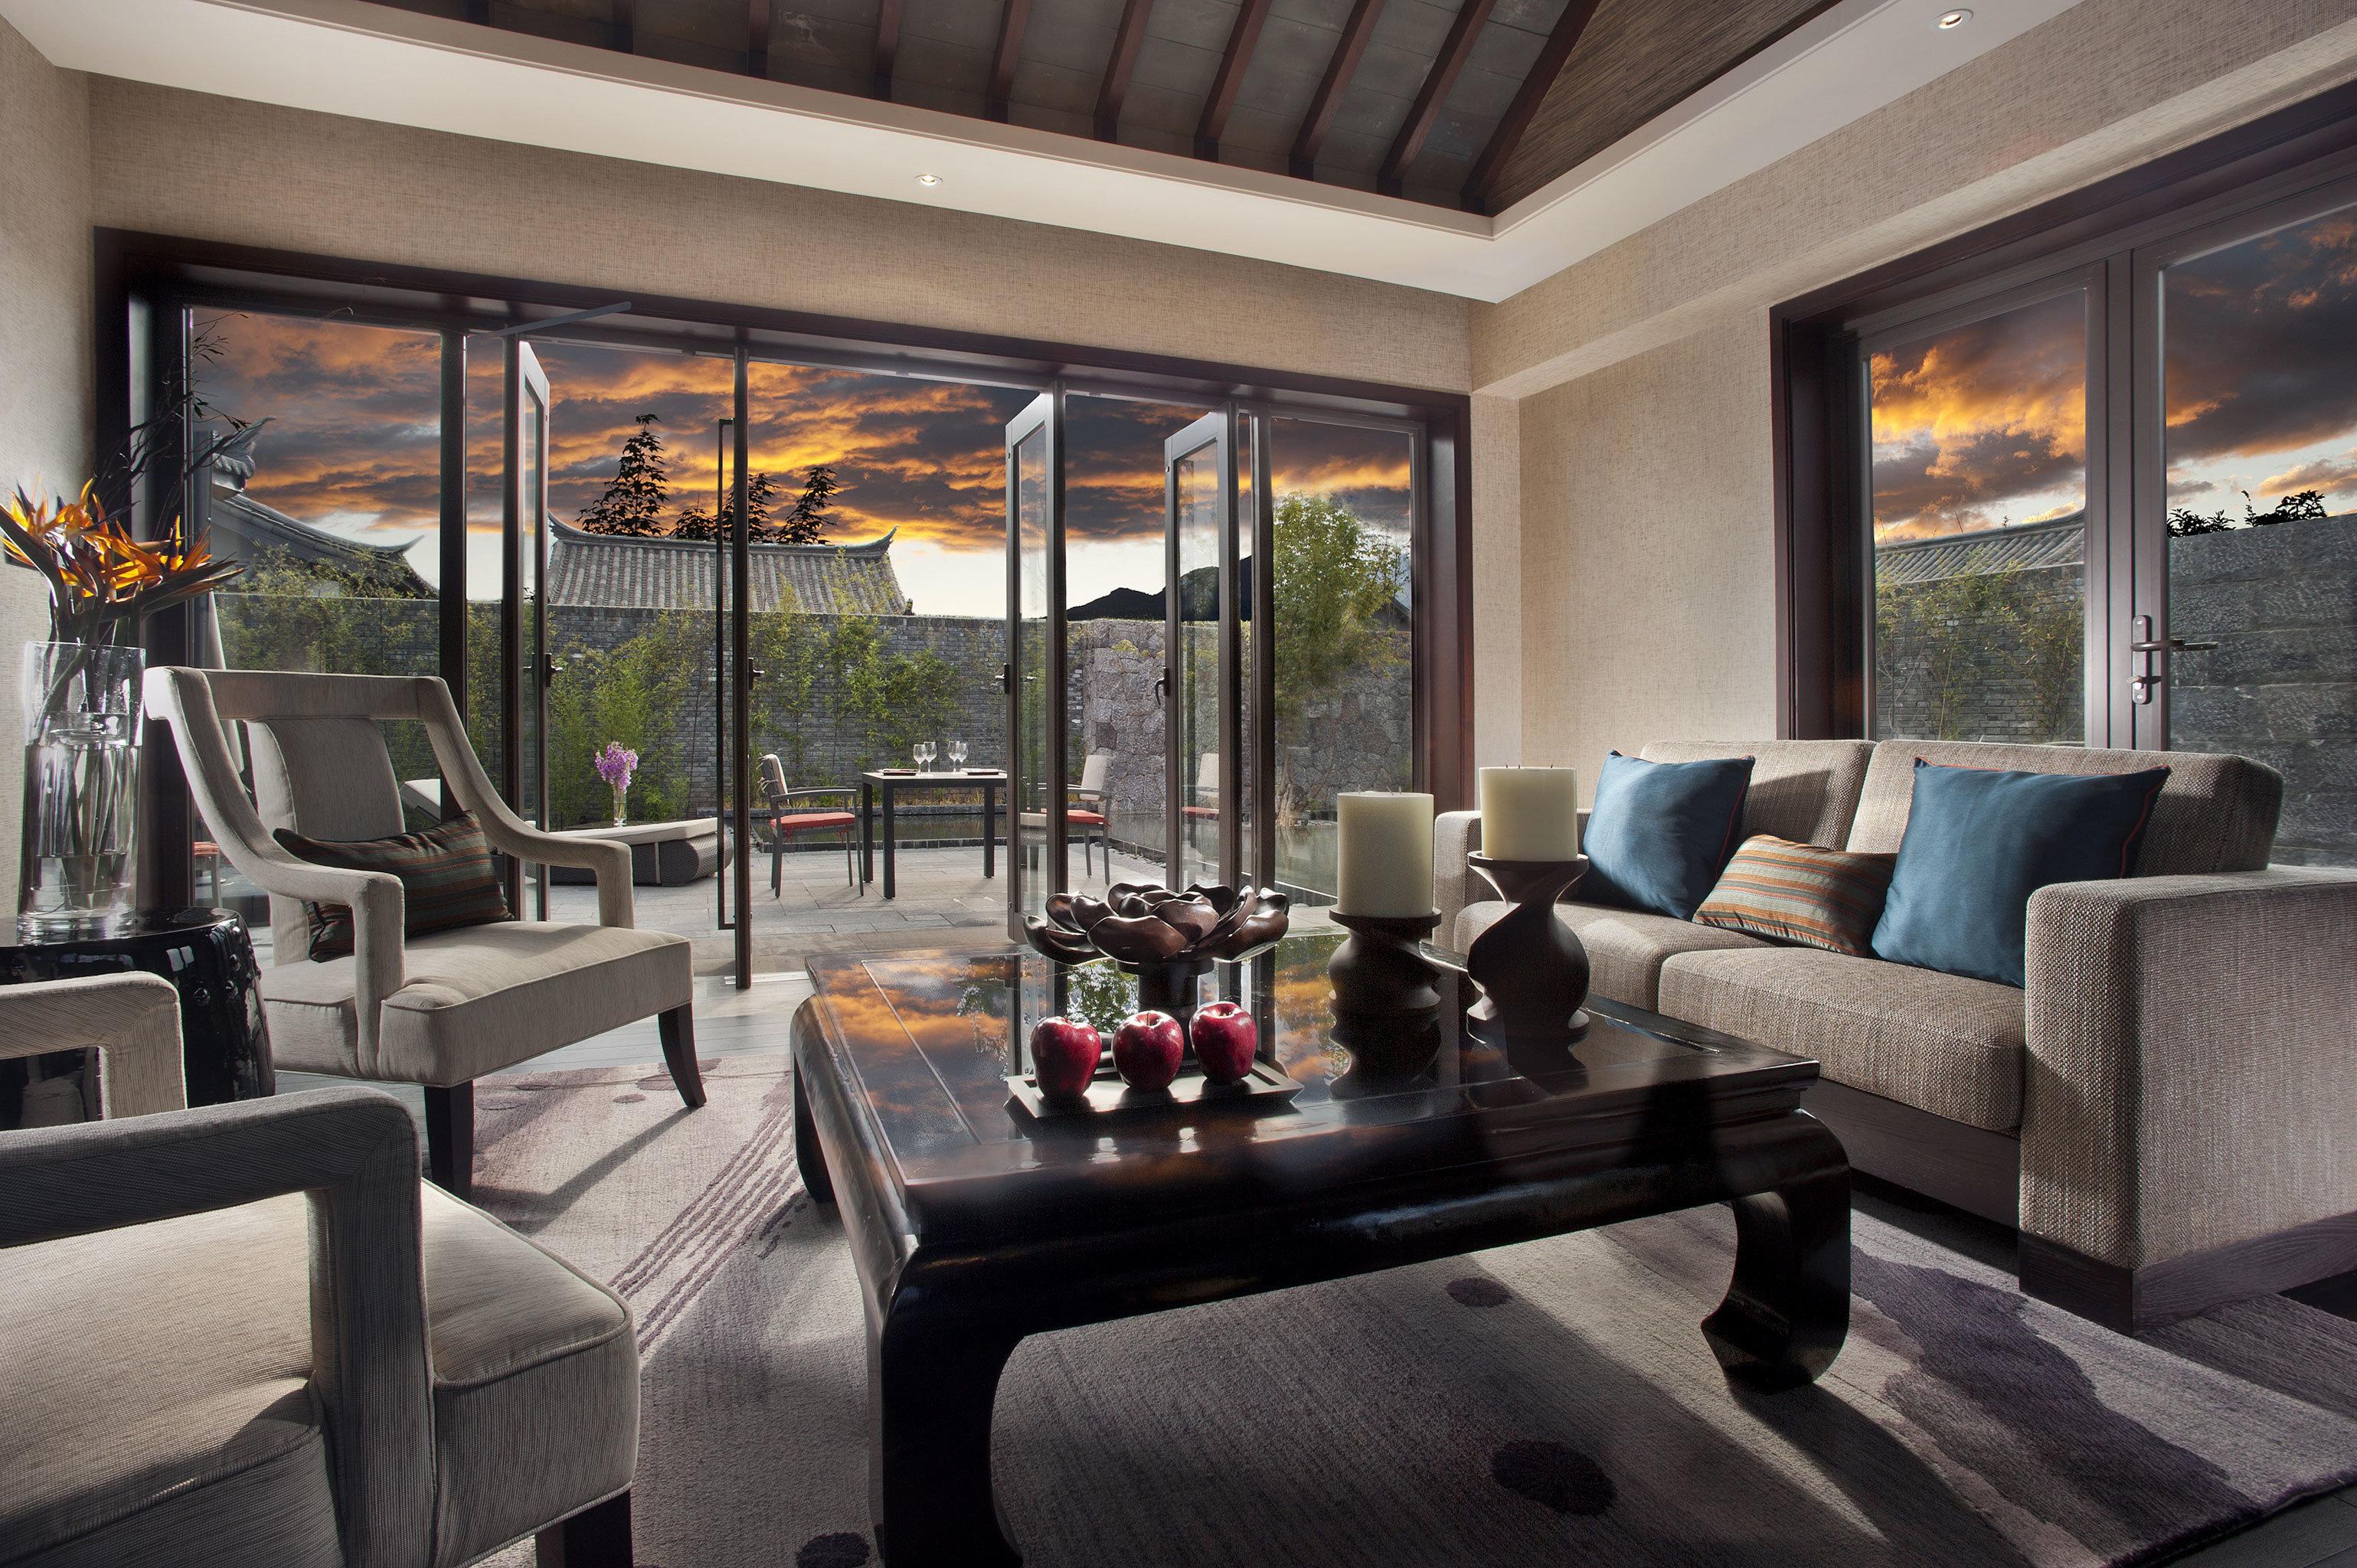 Classic Patio Resort sofa living room property condominium home Lobby Fireplace Villa Suite mansion